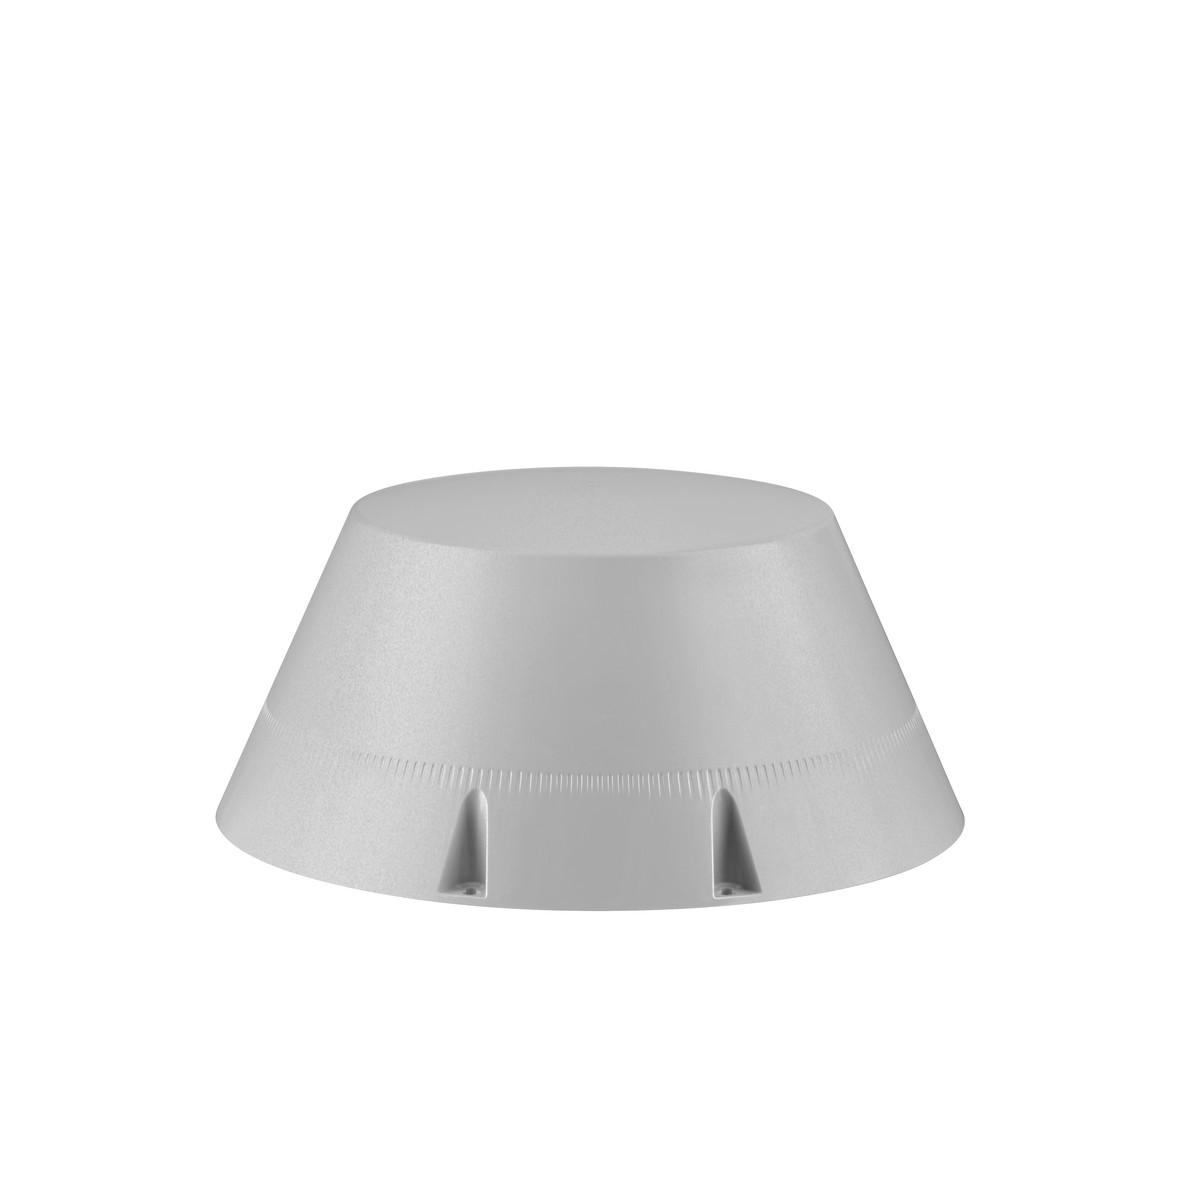 Philips TownTune tilbehør ZDP262 Dekorativ top cone Lys grå